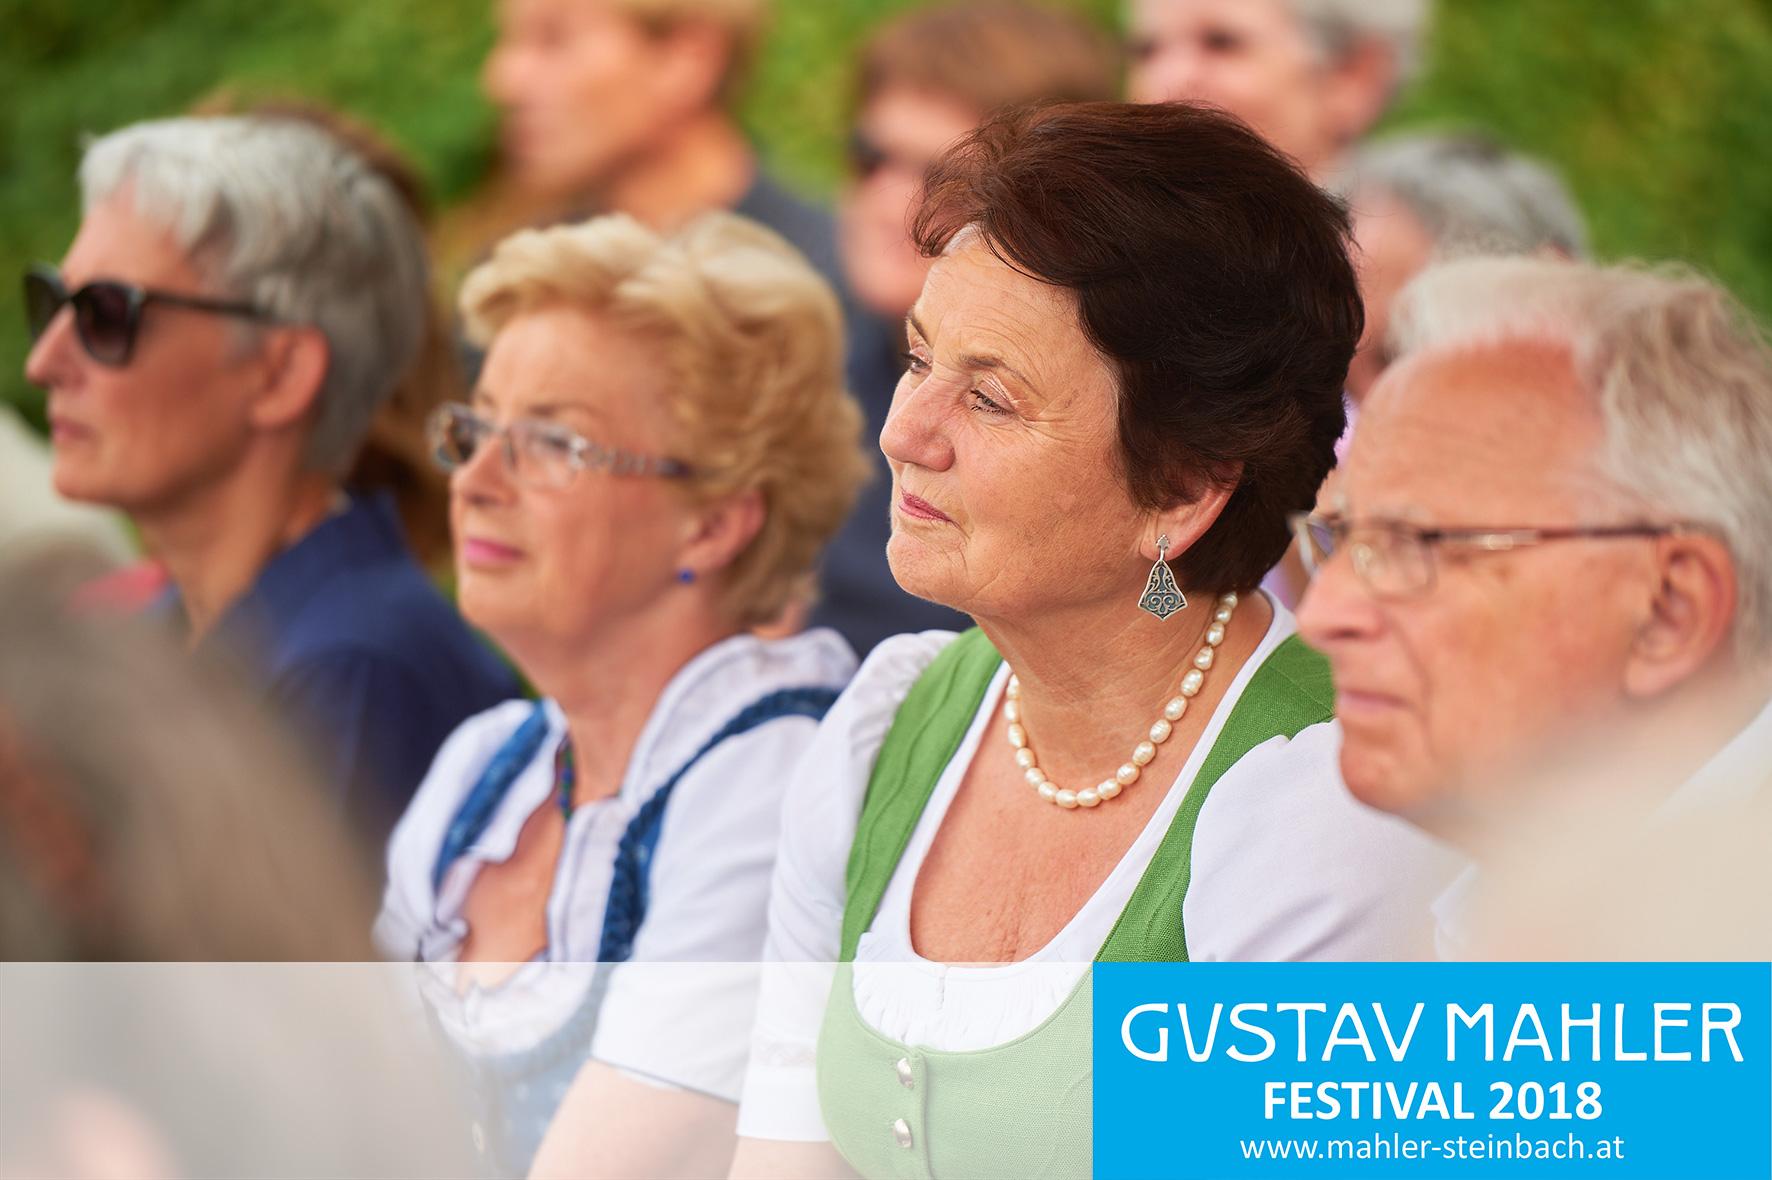 Eröffnung, 3. Gustav Mahler Festival Steinbach